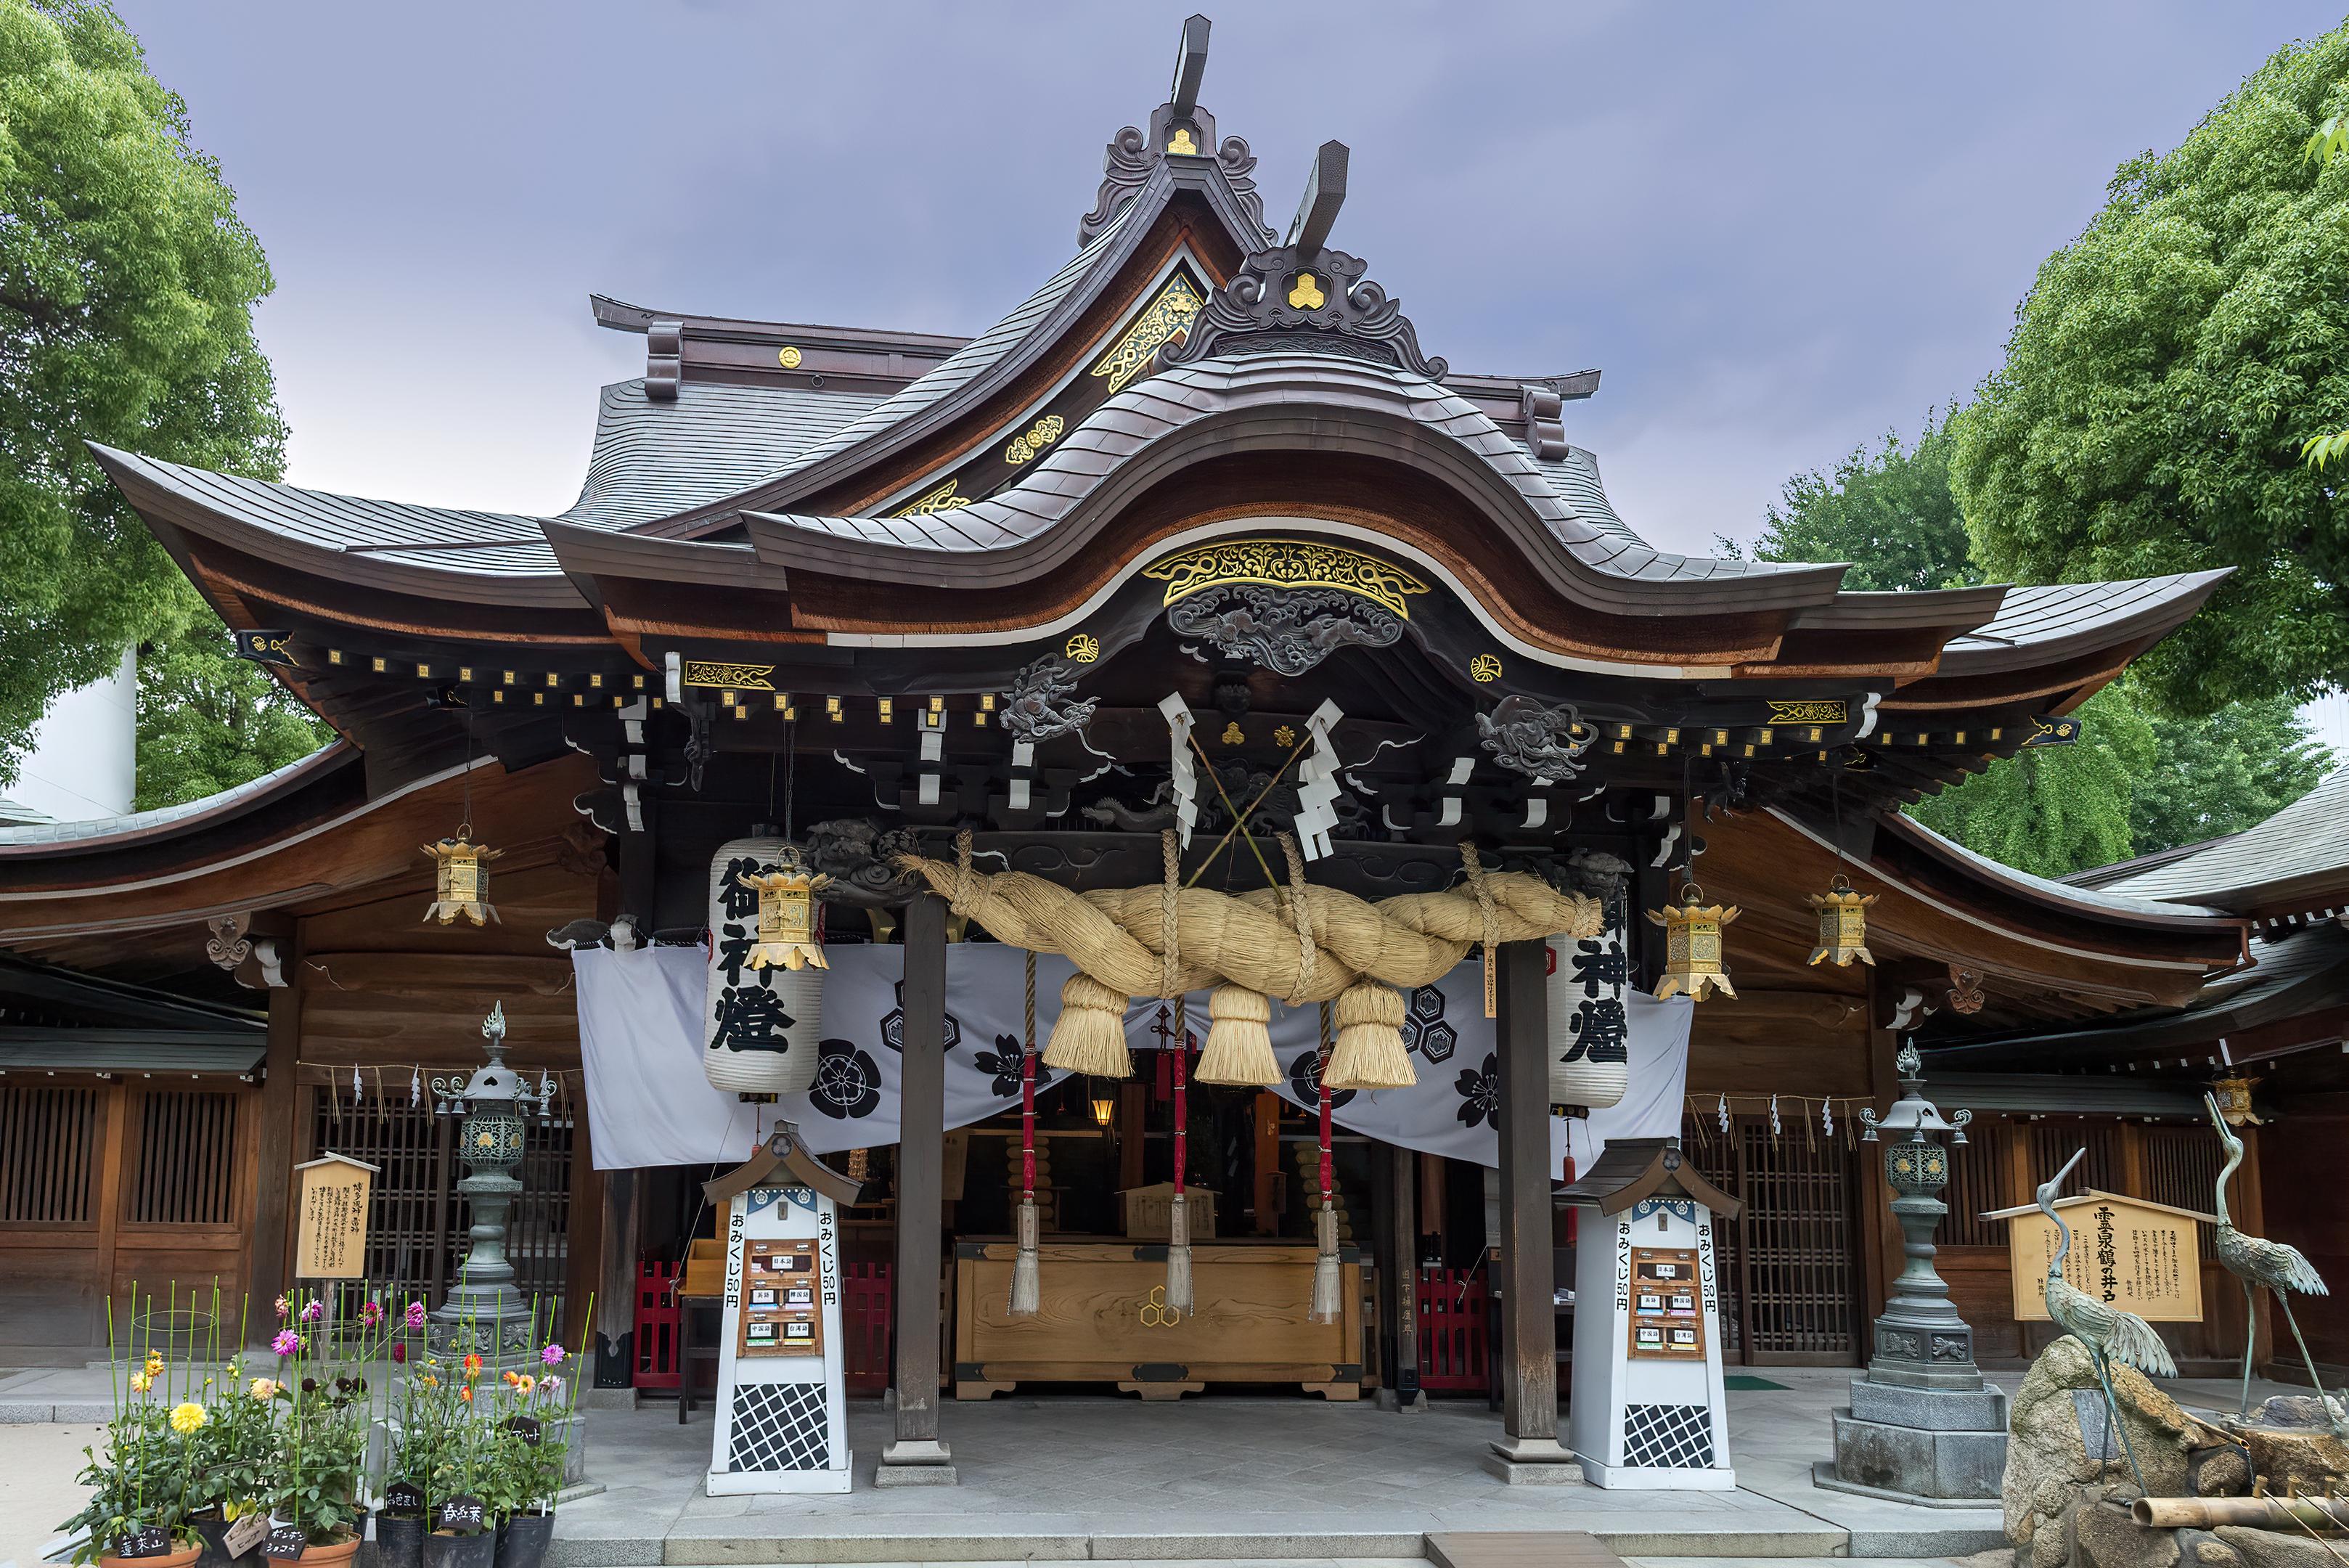 Kushida-jinja 櫛田神社 fukuoka topaz denoise ai-clear